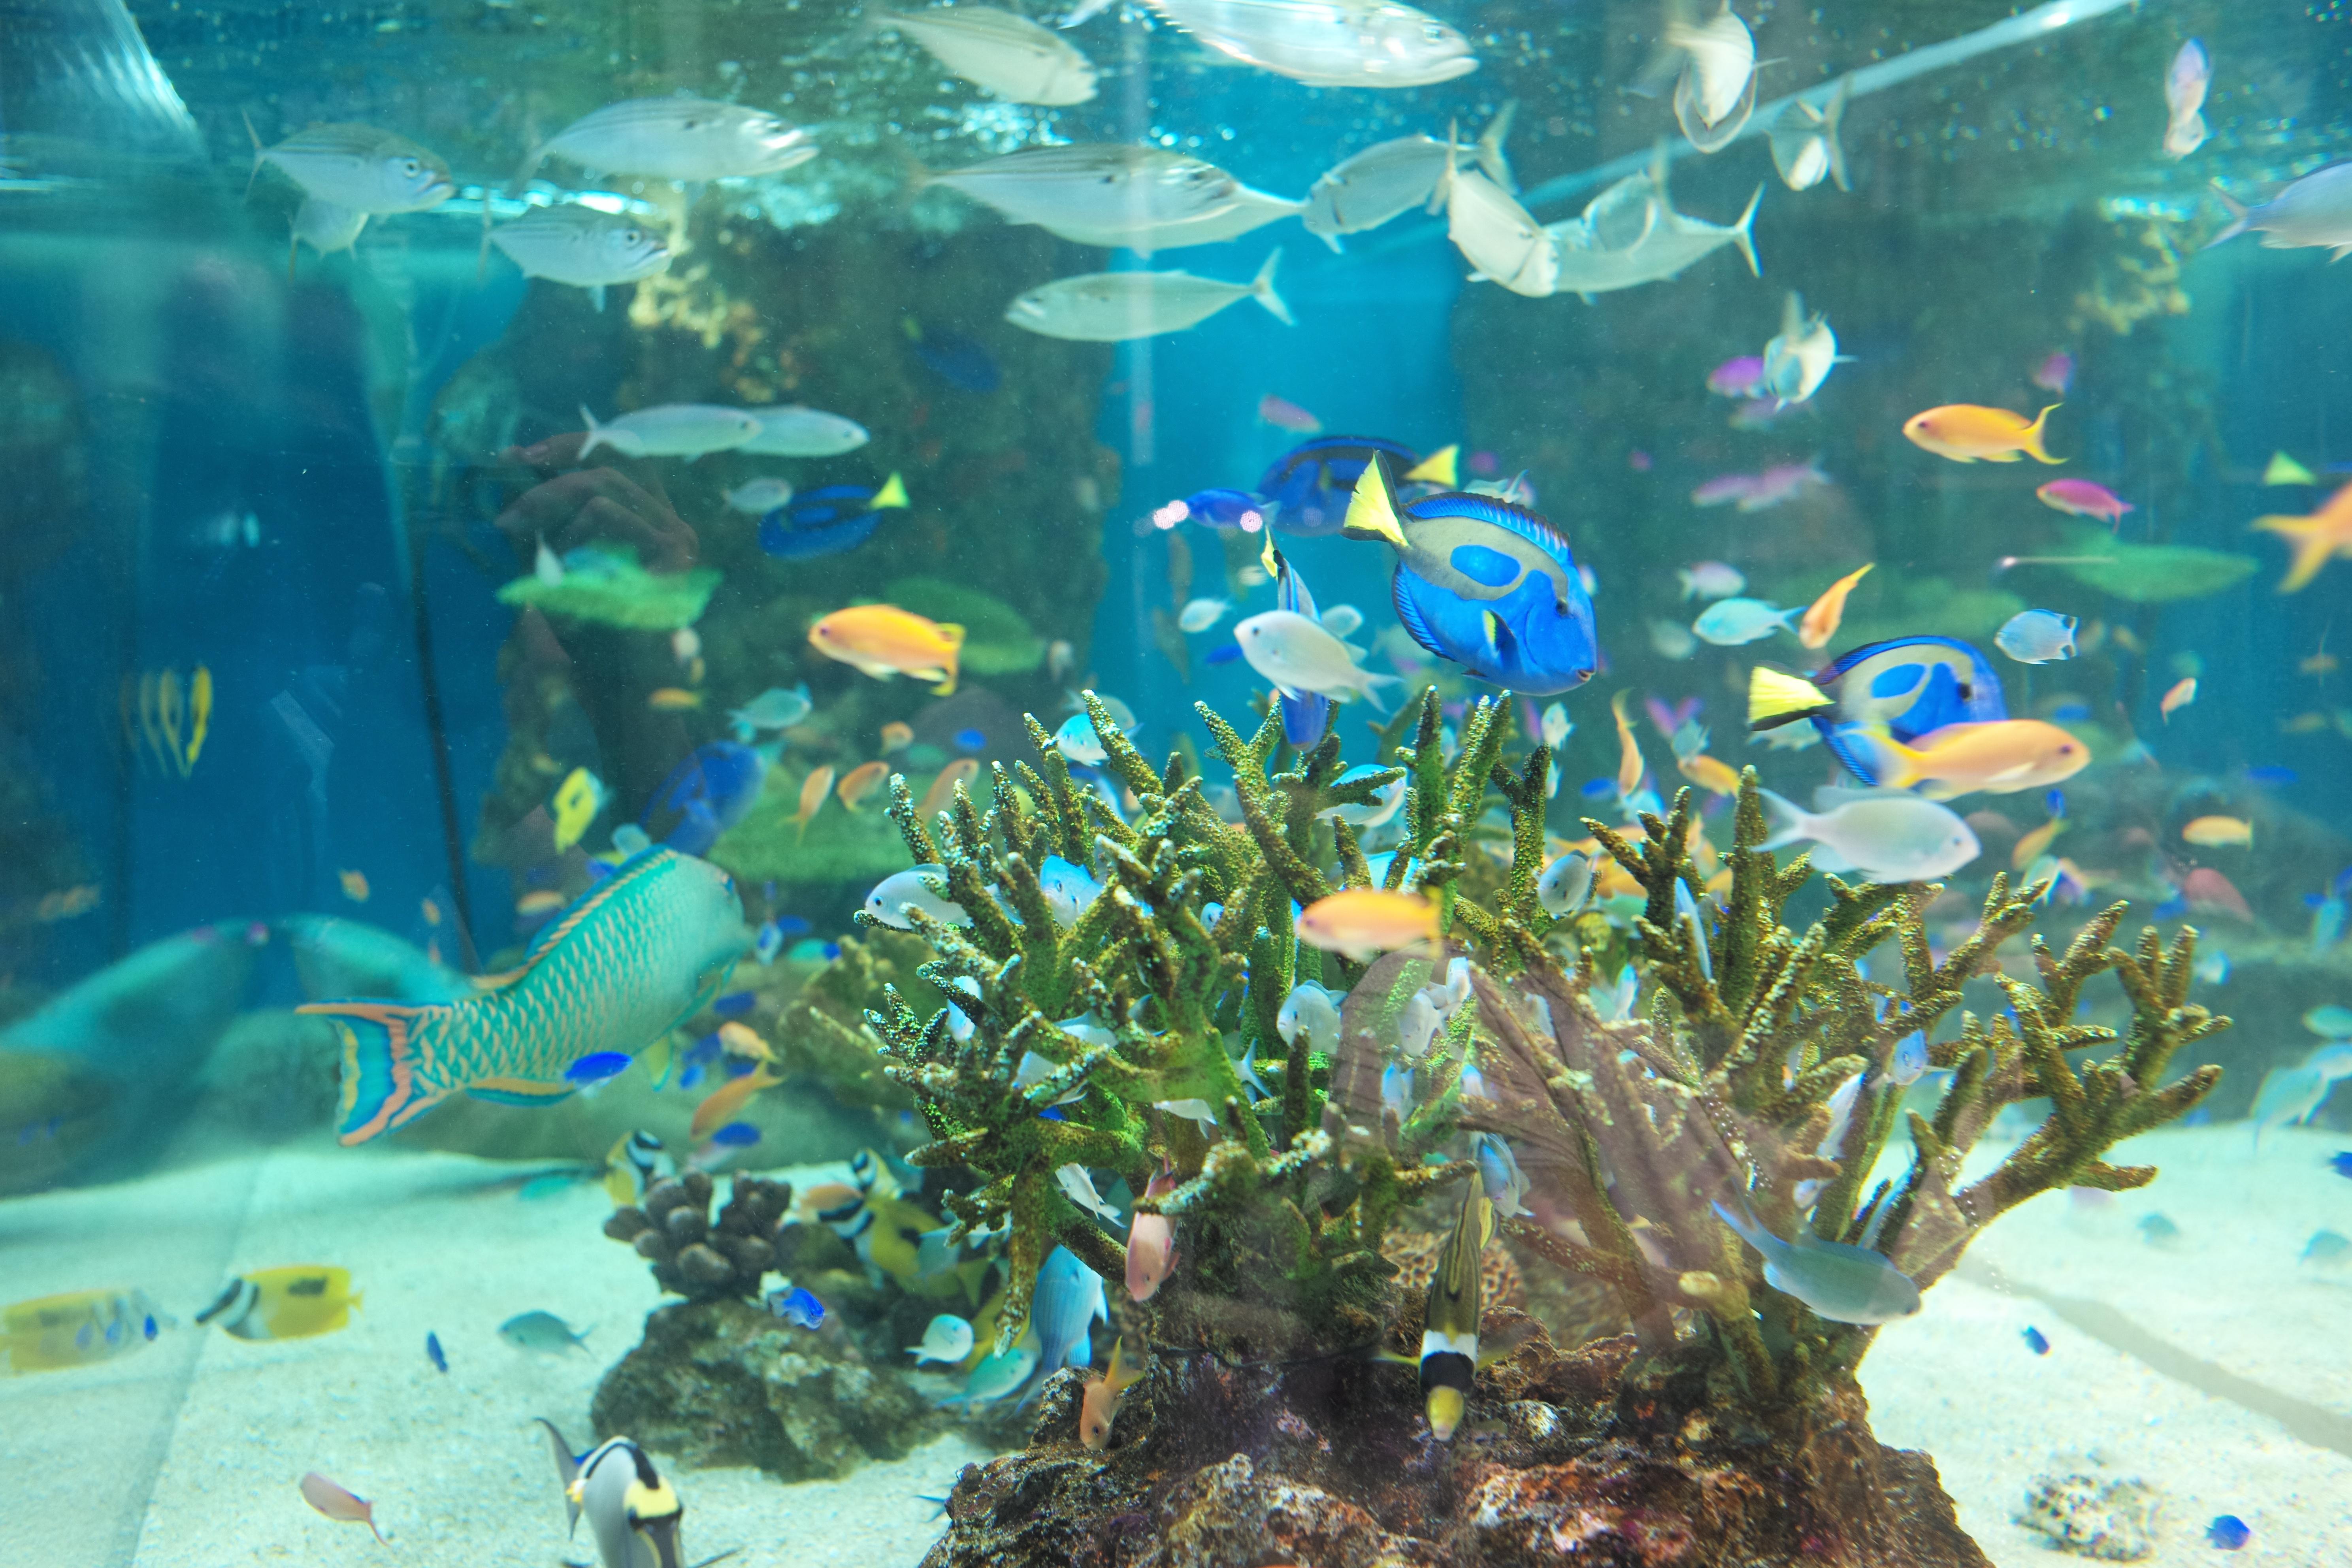 fond d 39 cran poisson sous marin r cif de corail aquarium leica tokyo m la biologie. Black Bedroom Furniture Sets. Home Design Ideas